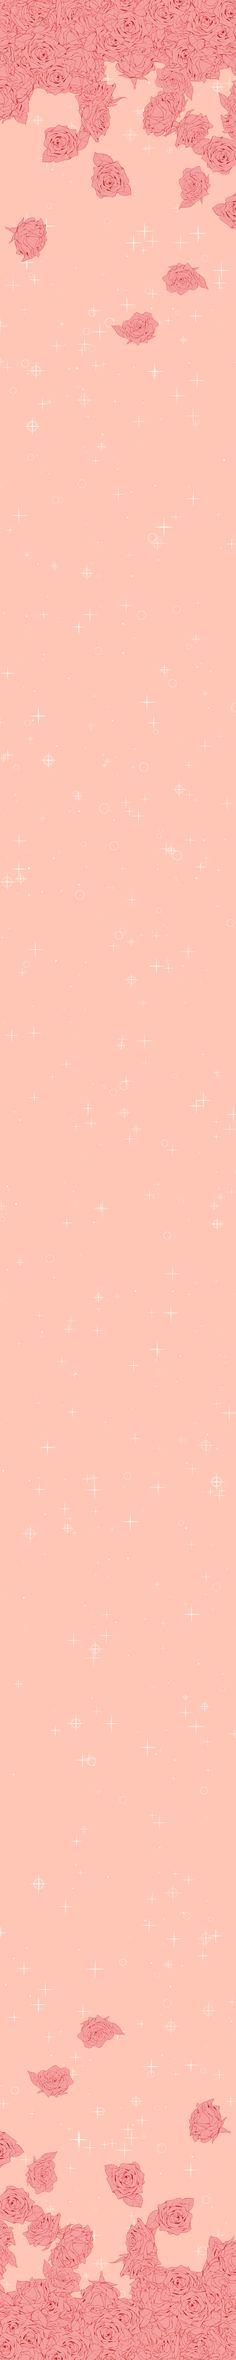 Glitter Rose - Custom Box Background by RorrieGoesRawr on DeviantArt